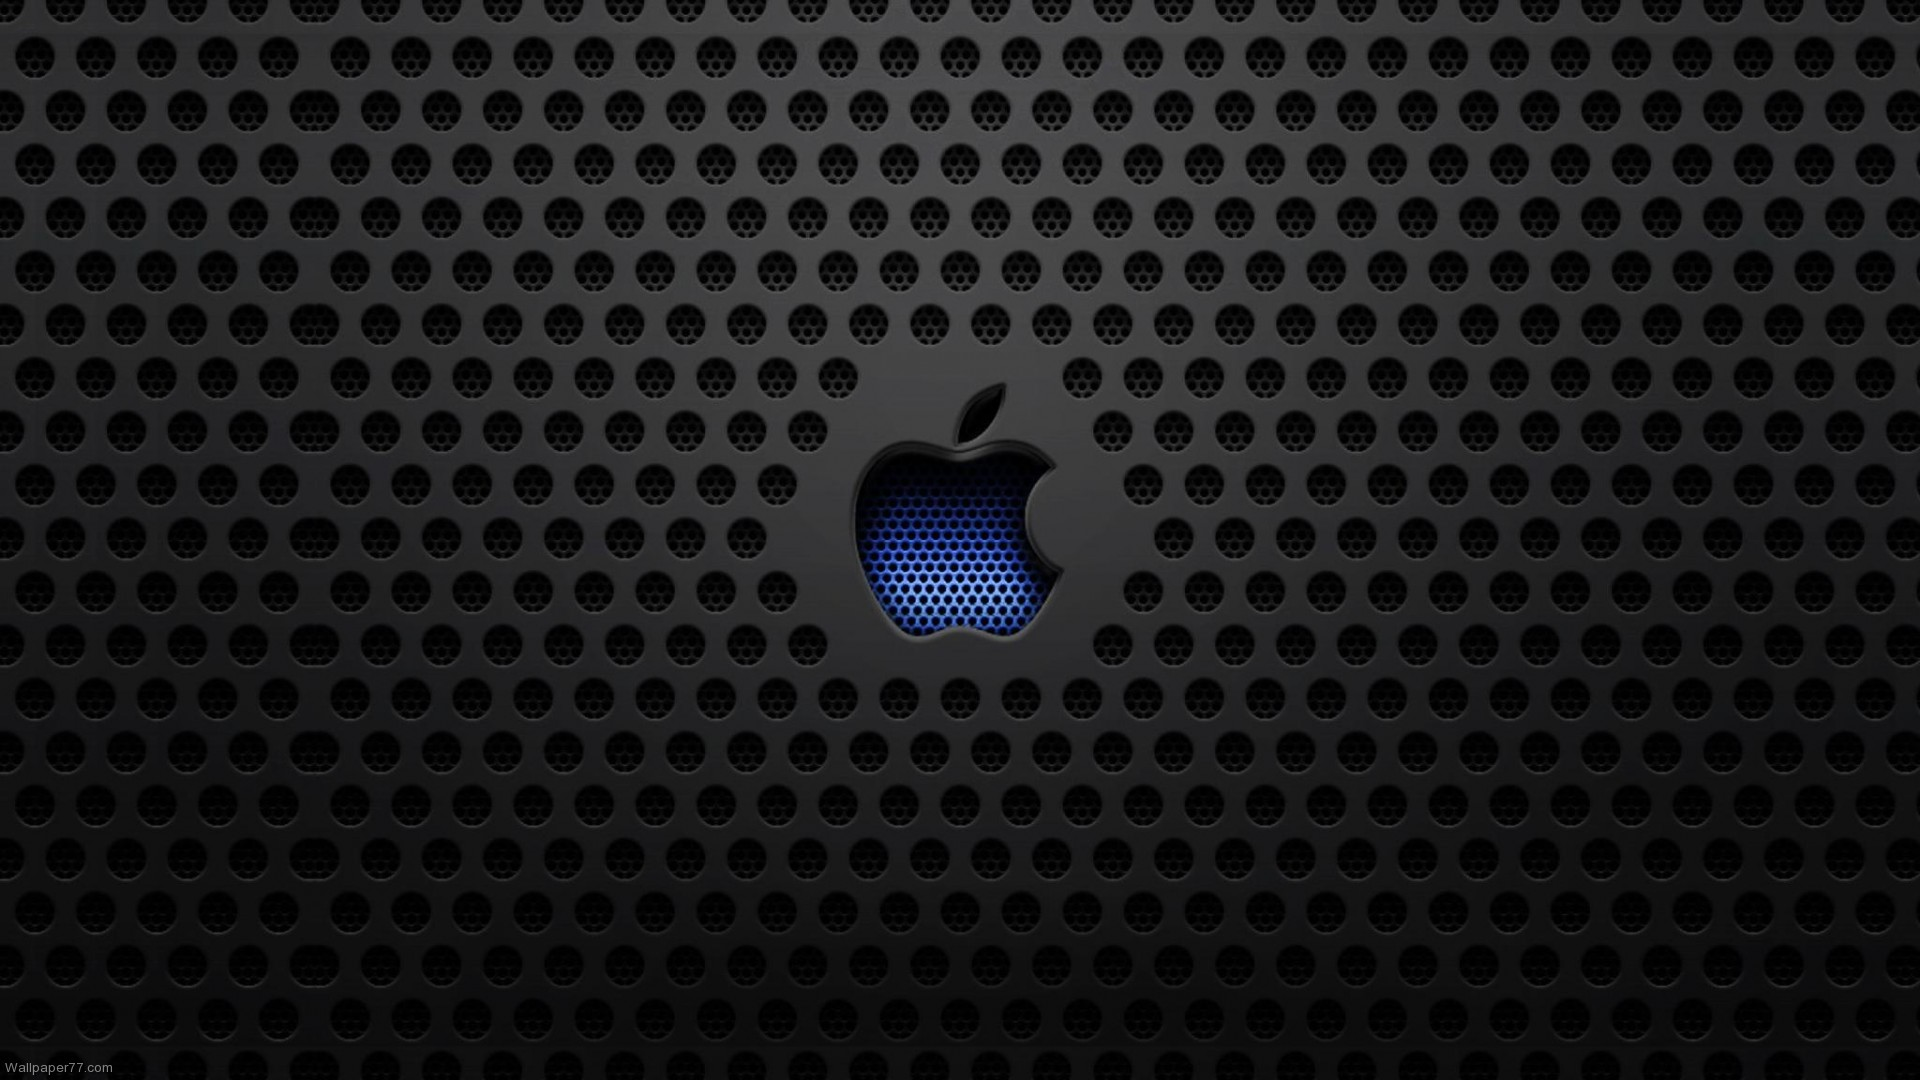 Simple Wallpaper Mac Retina Display - qgecBK  You Should Have_376542.jpg